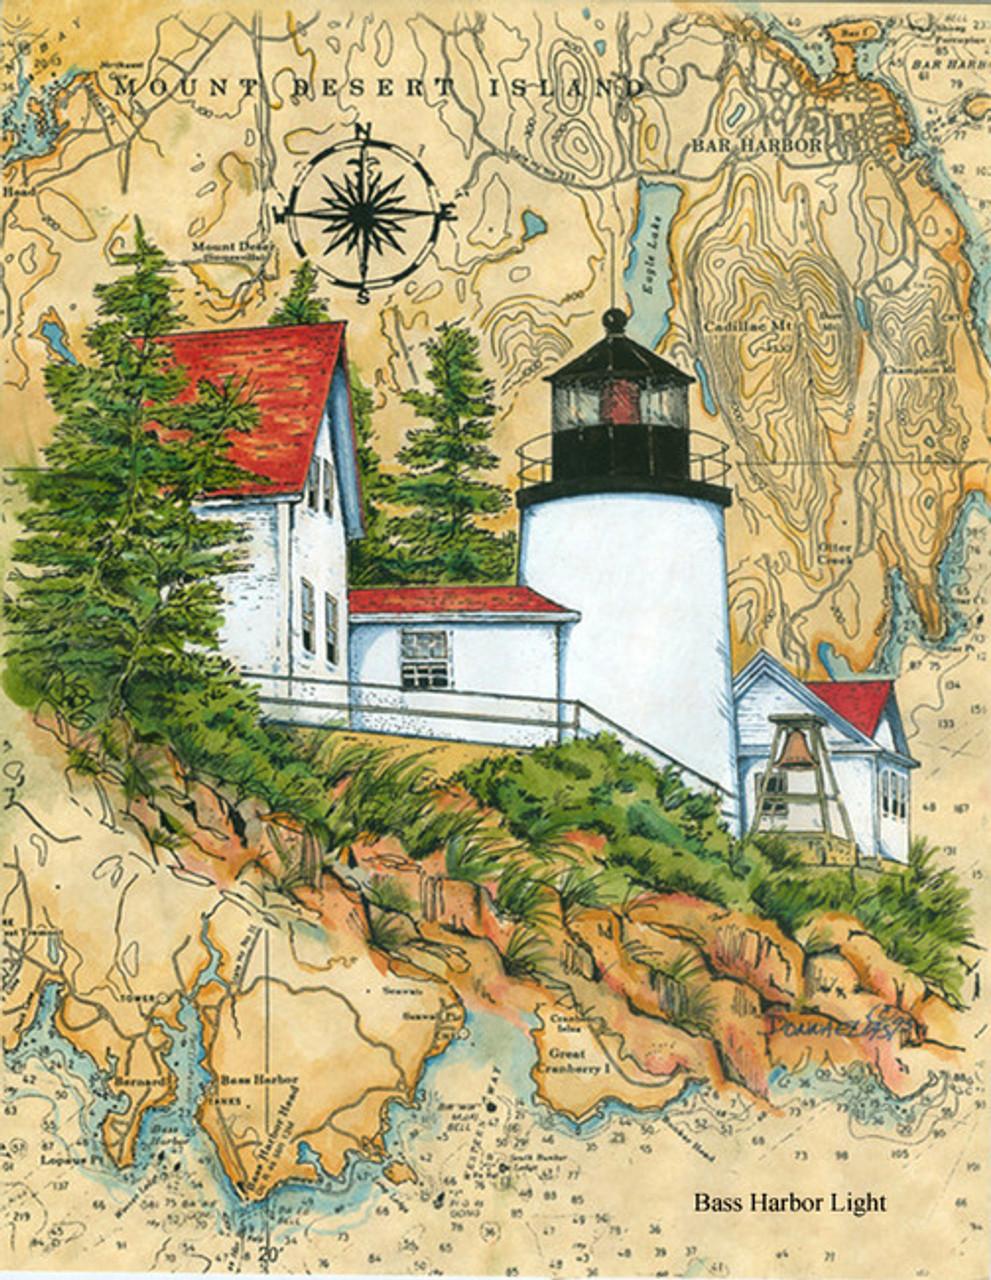 Bass Harbor Head LighthouseSea Chart